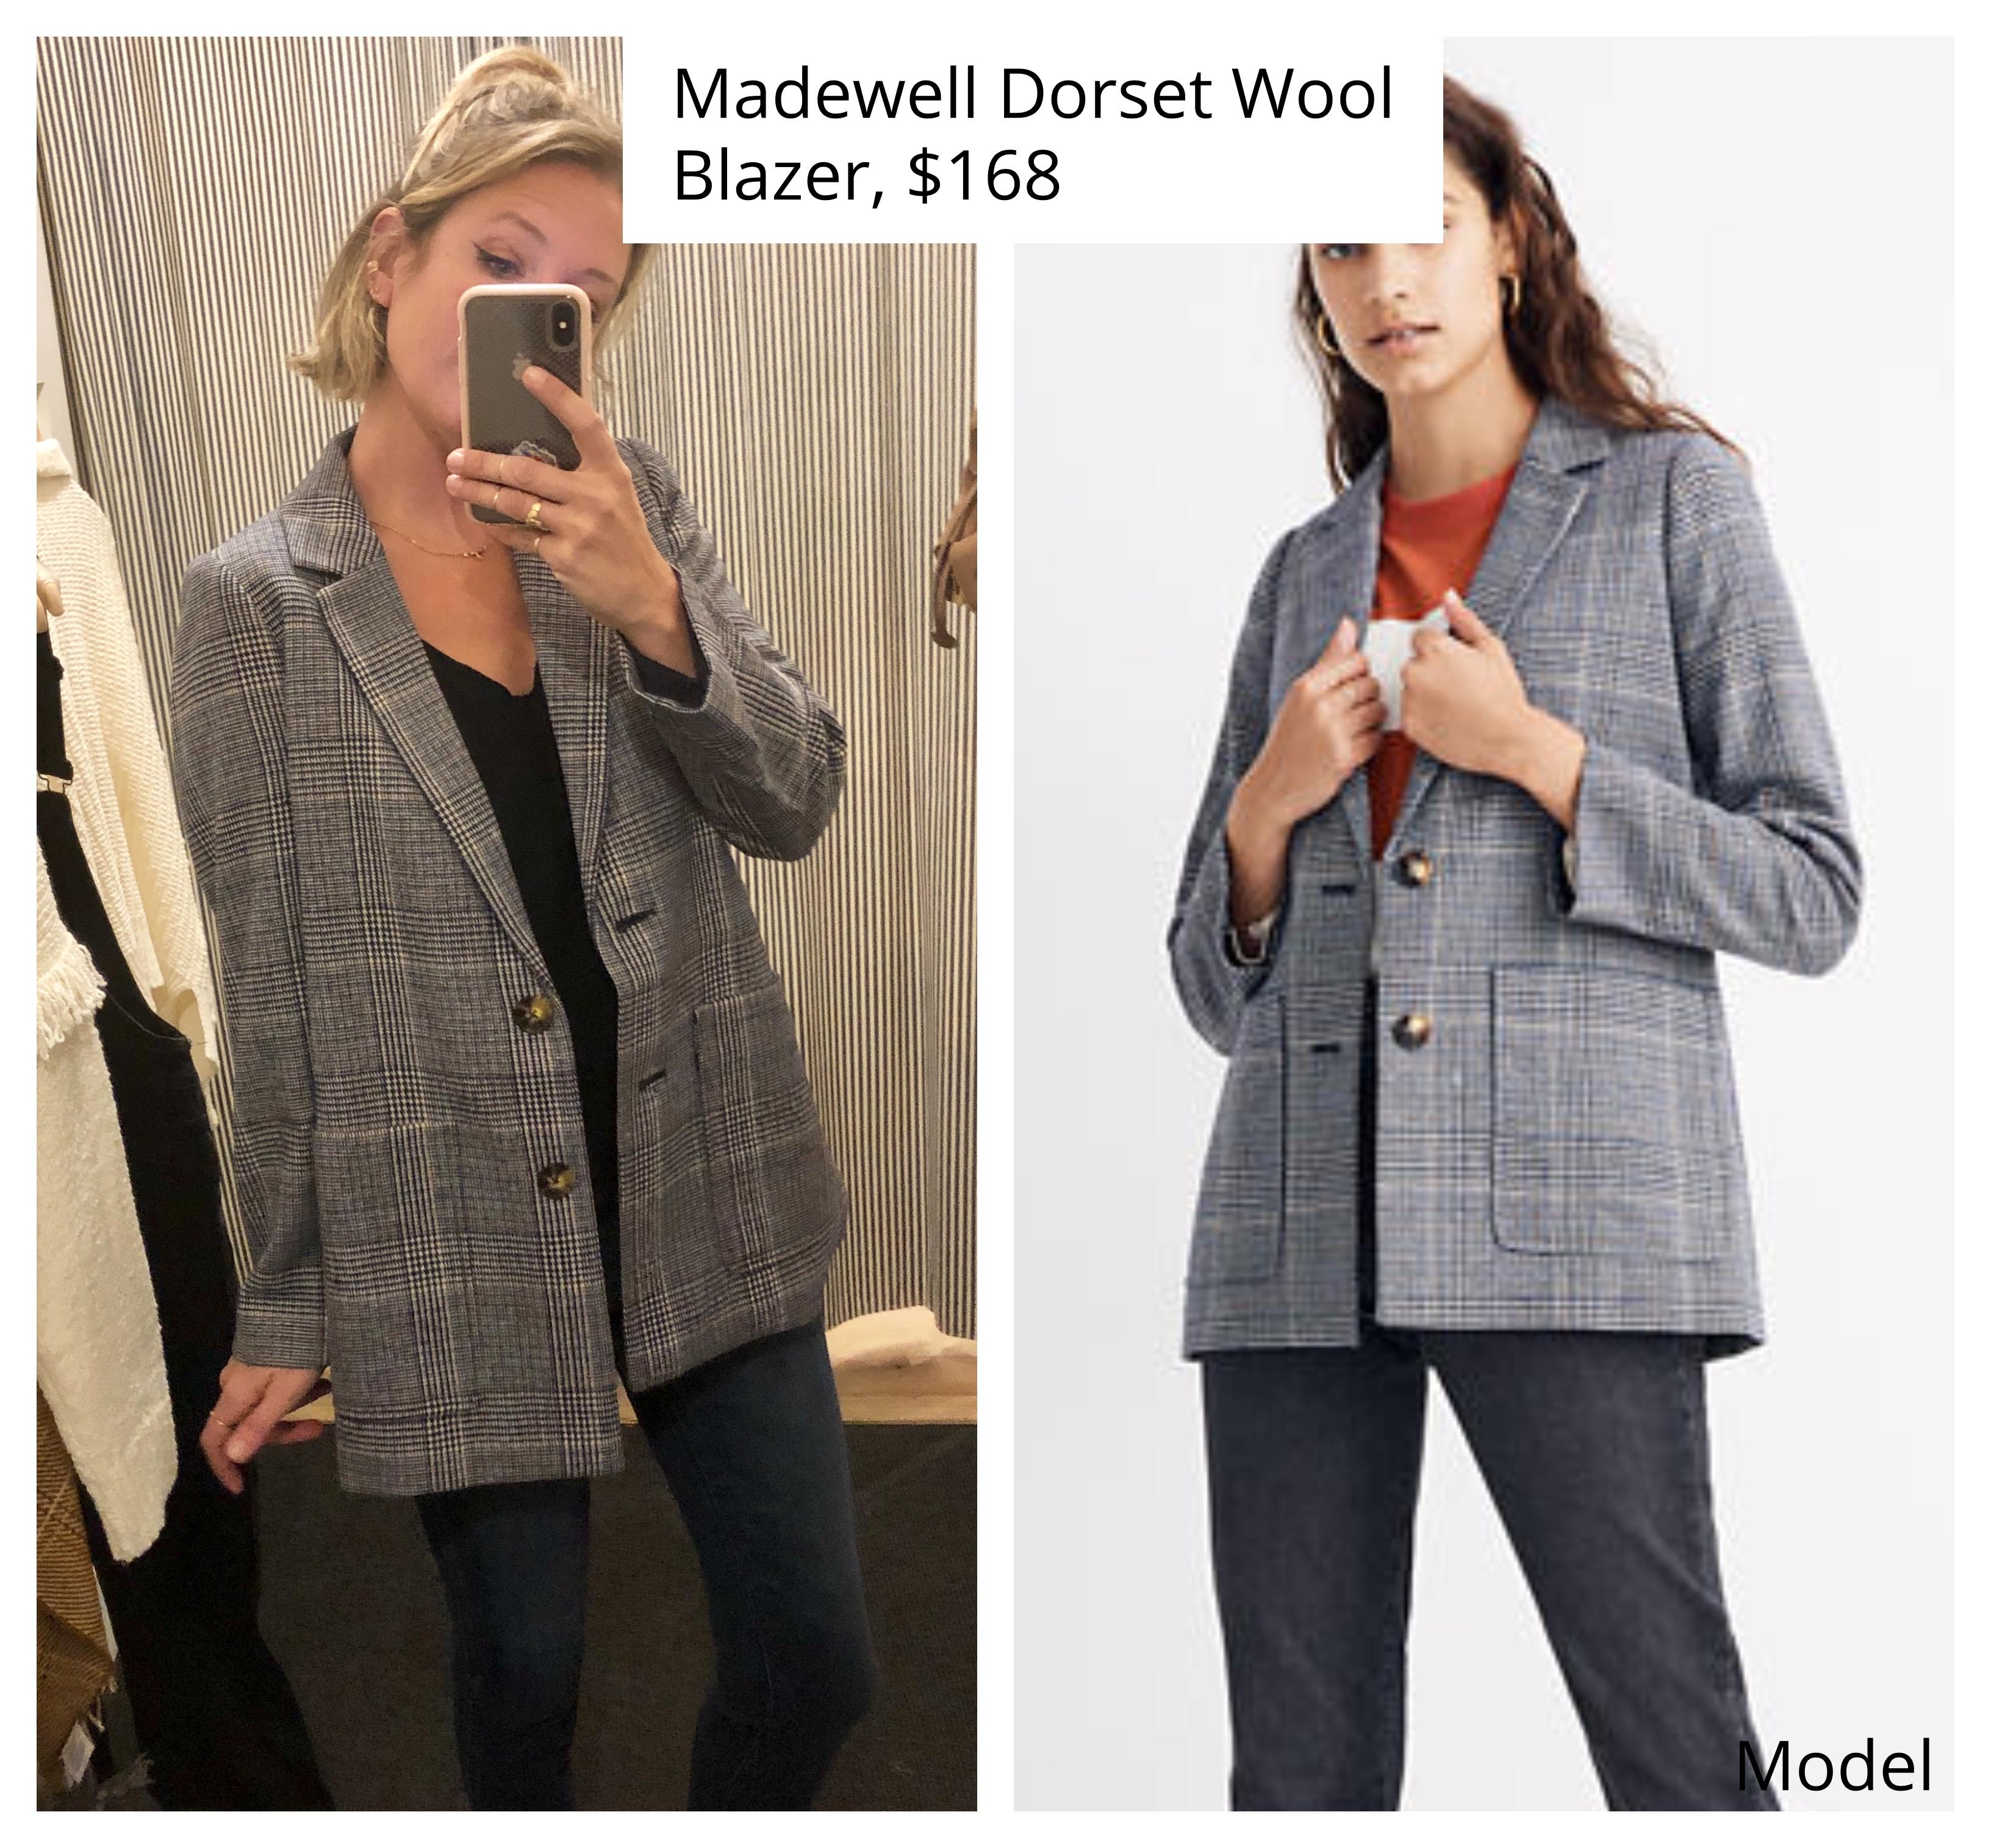 madewell dorset wool plaid blazer